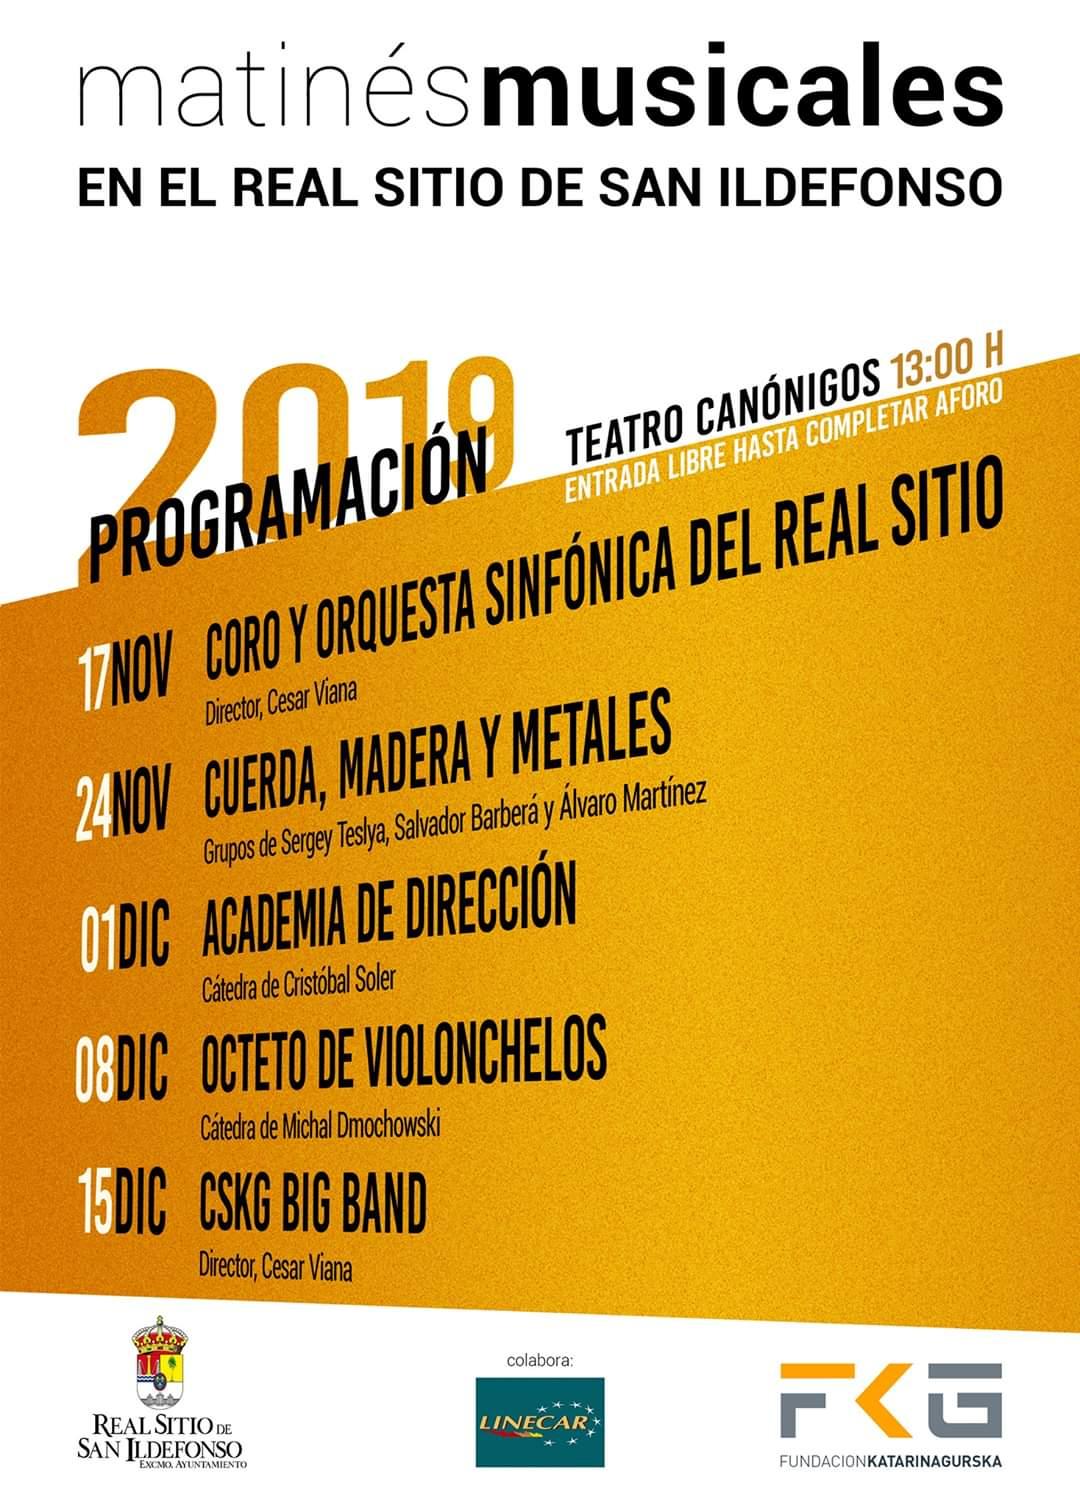 Matinés Musicales en el Real Sitio de San Ildefonso